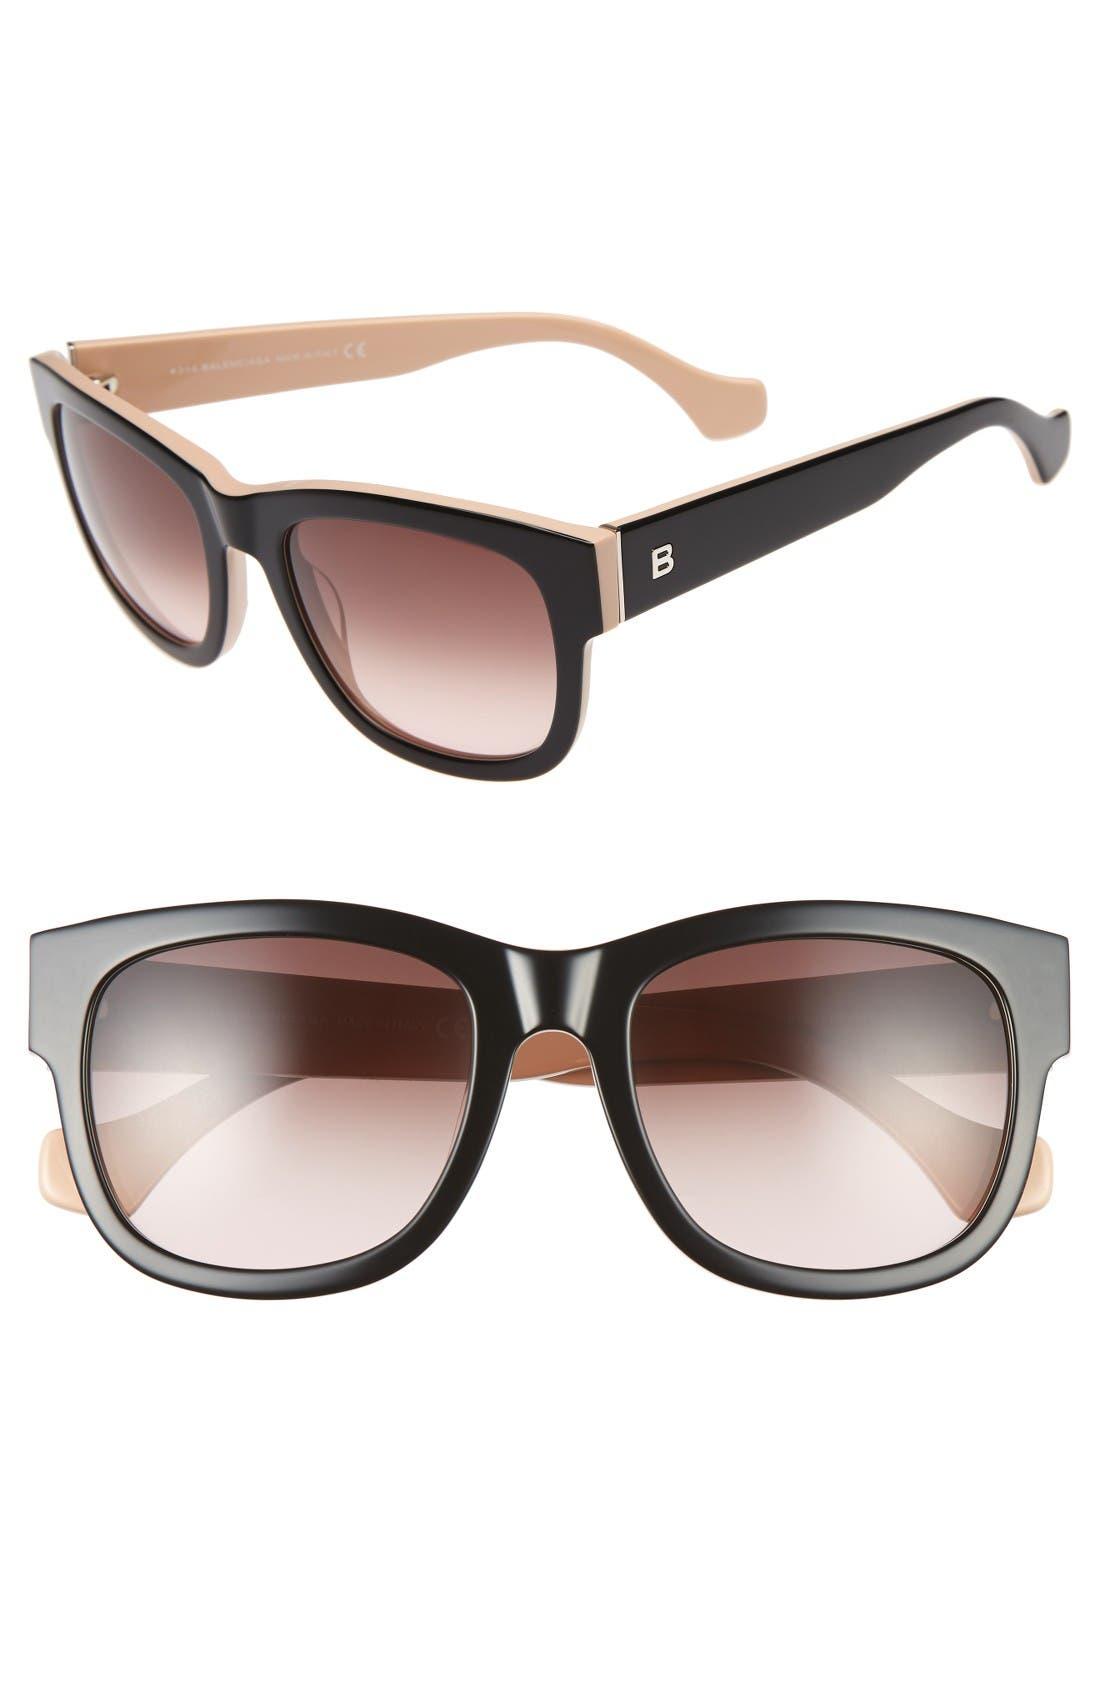 Main Image - Balenciaga 54mm Retro Sunglasses